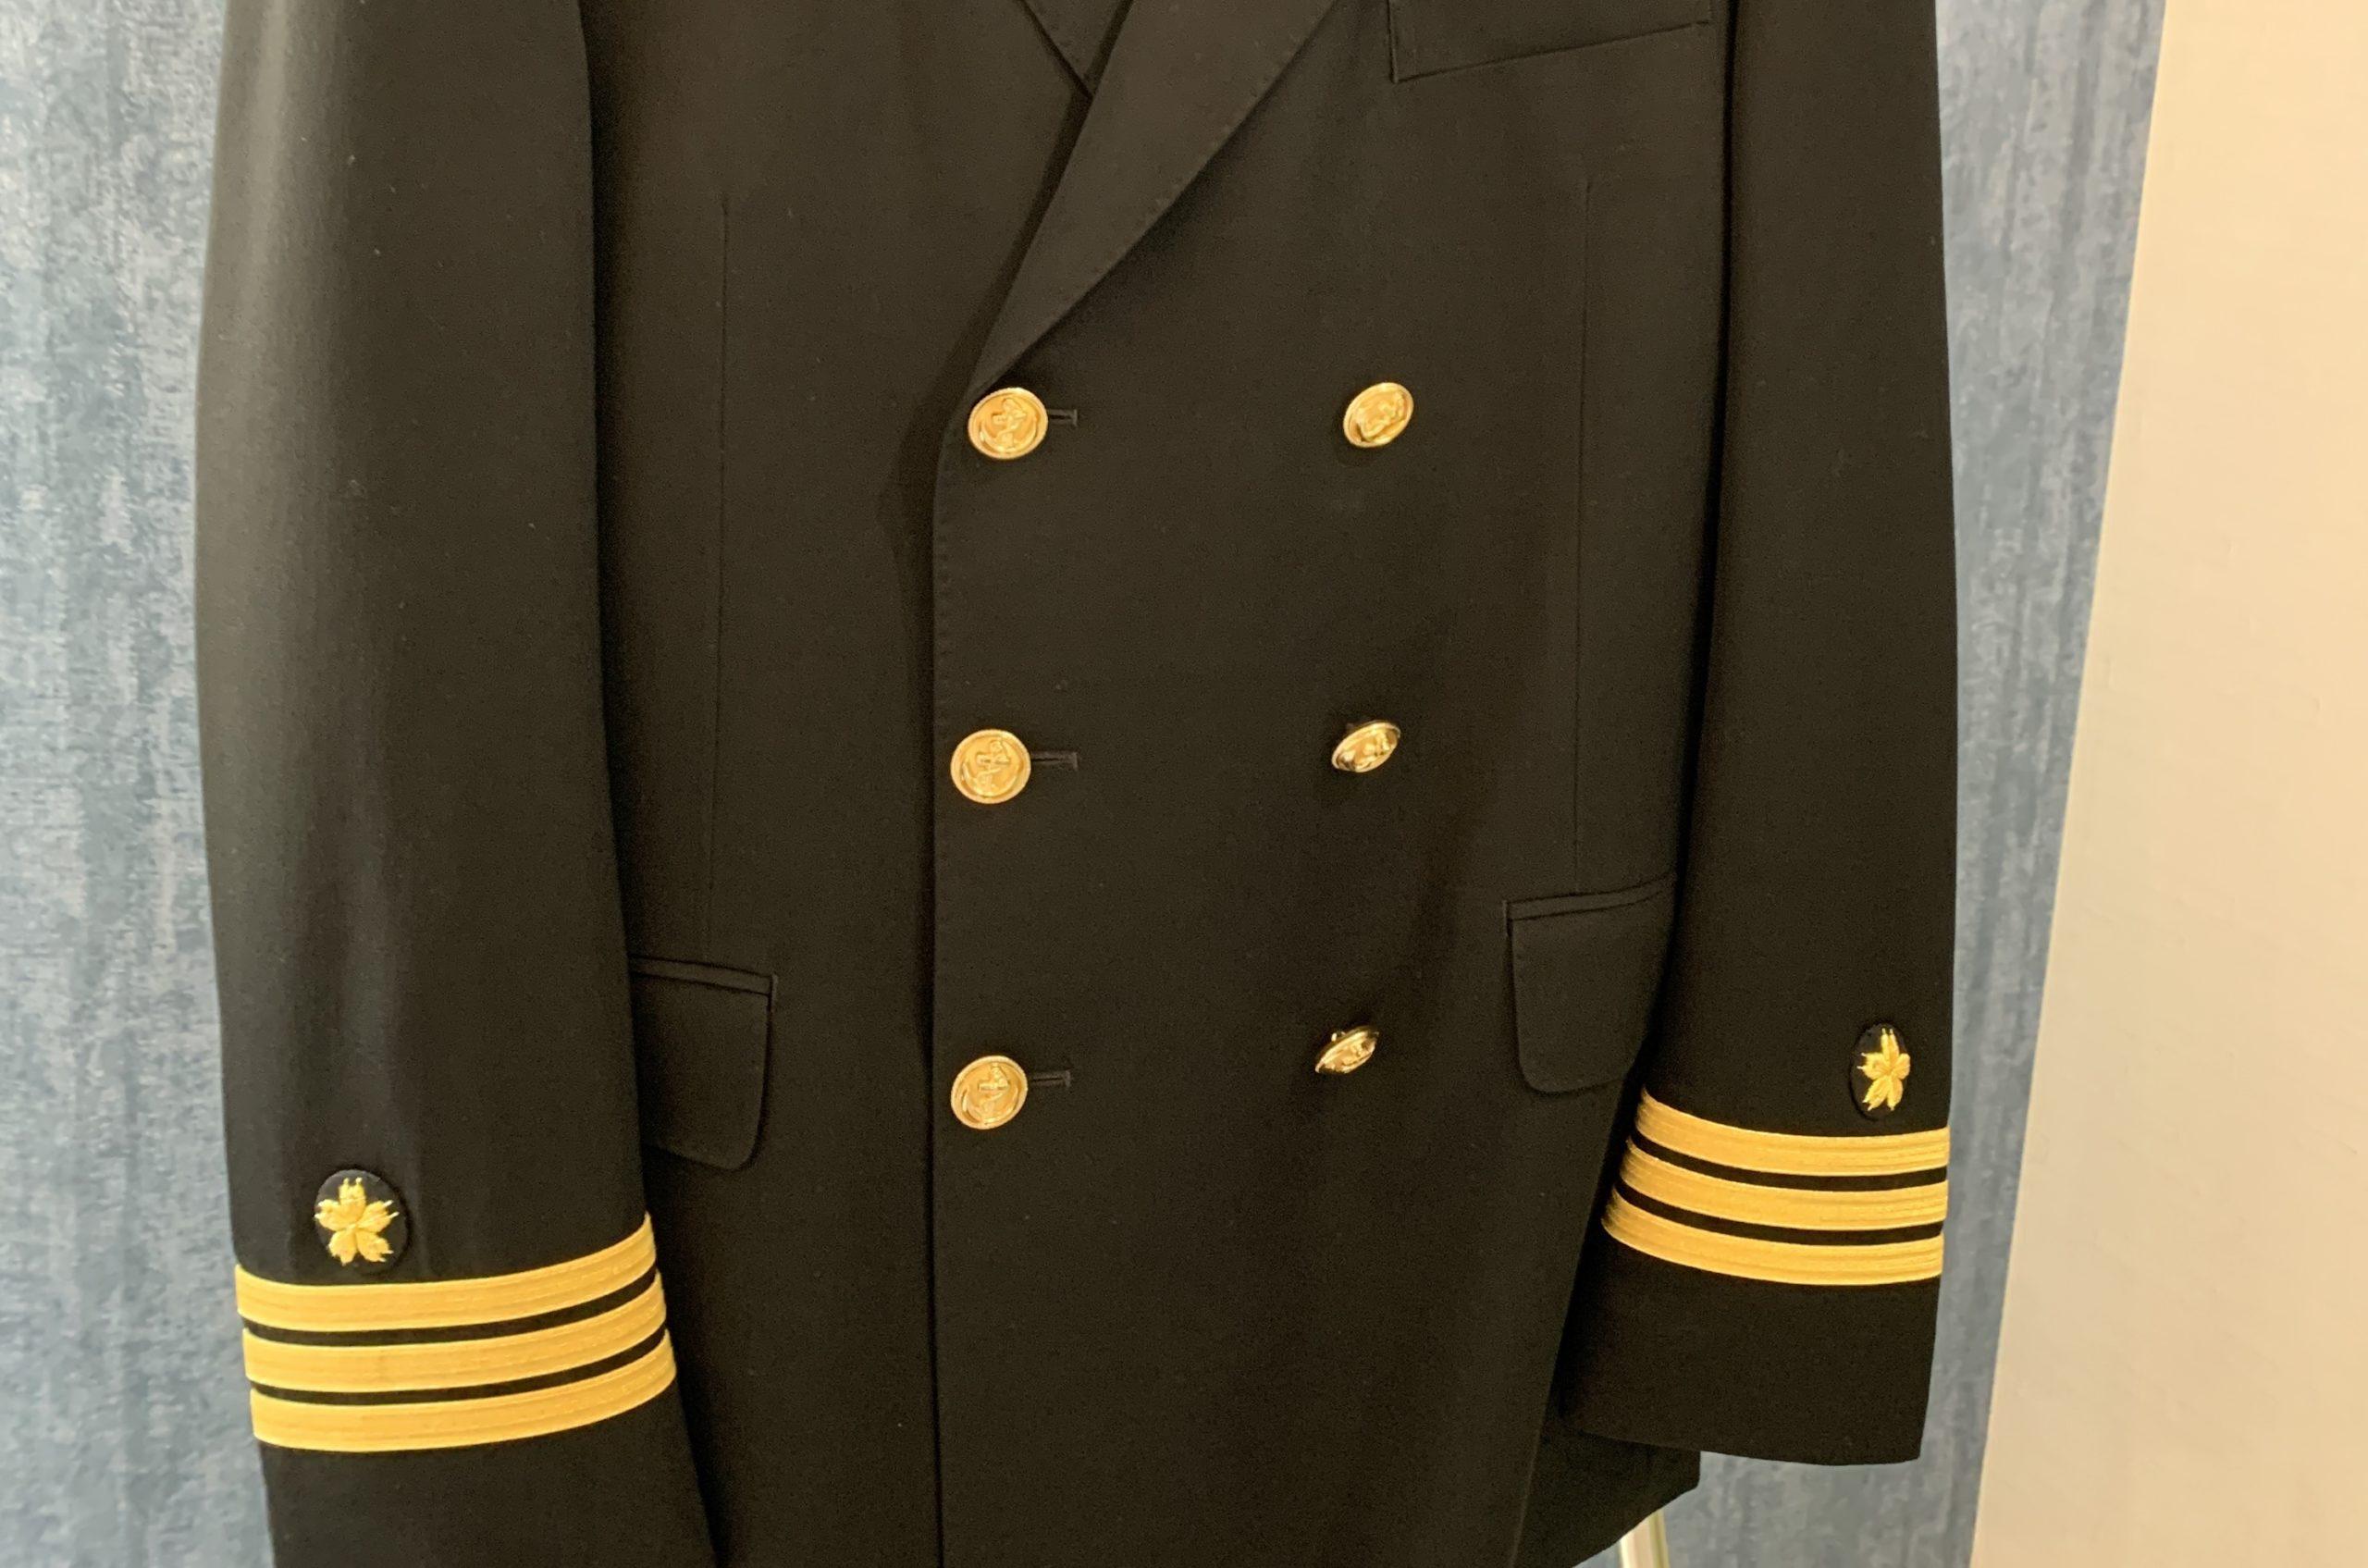 海上自衛官の制服